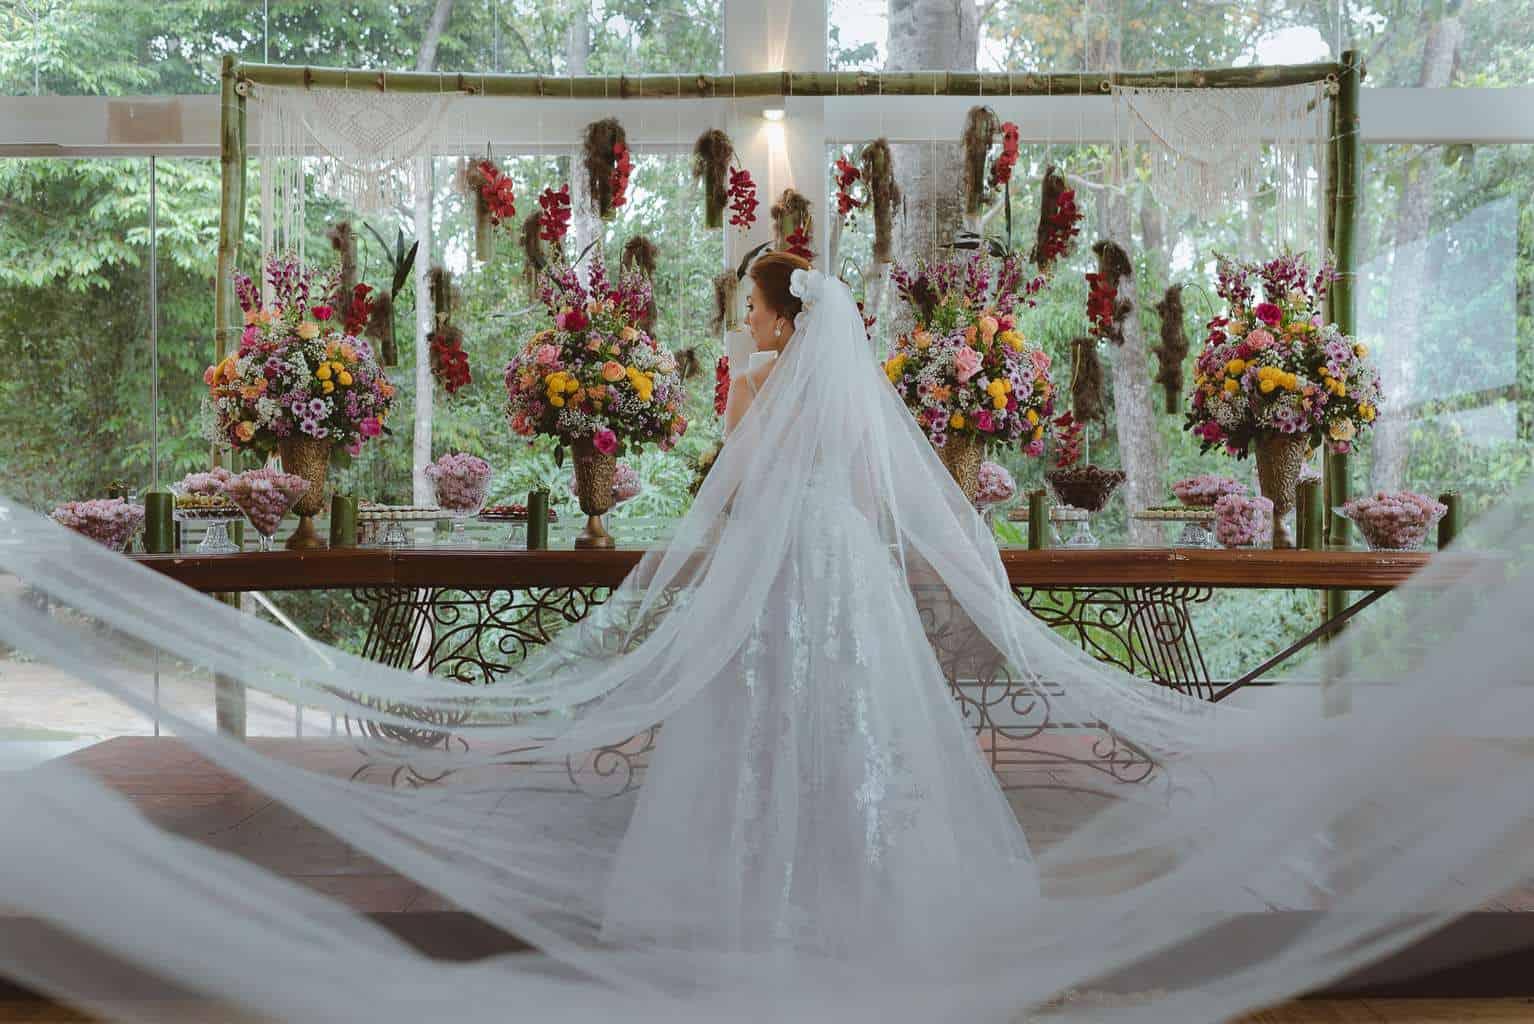 casamento-ao-ar-livre-casamento-boho-casamento-geek-casamento-rustico-casamento-Thais-e-Pedro-noiva-Revoar-Fotografia-Villa-Borghese-Eventos-53